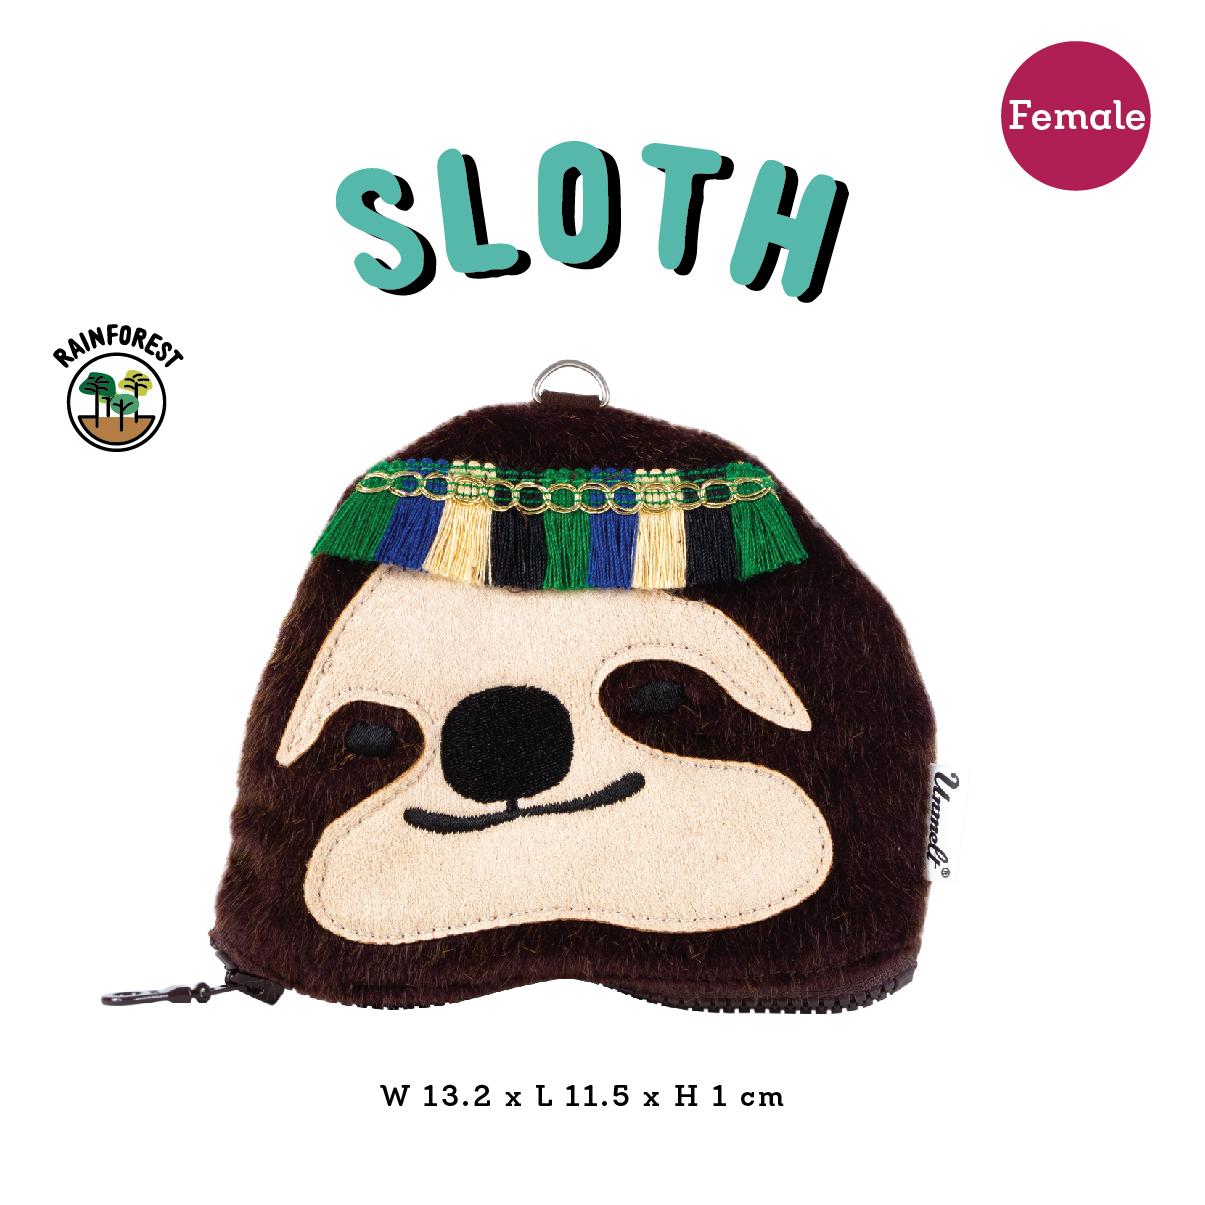 sloth female